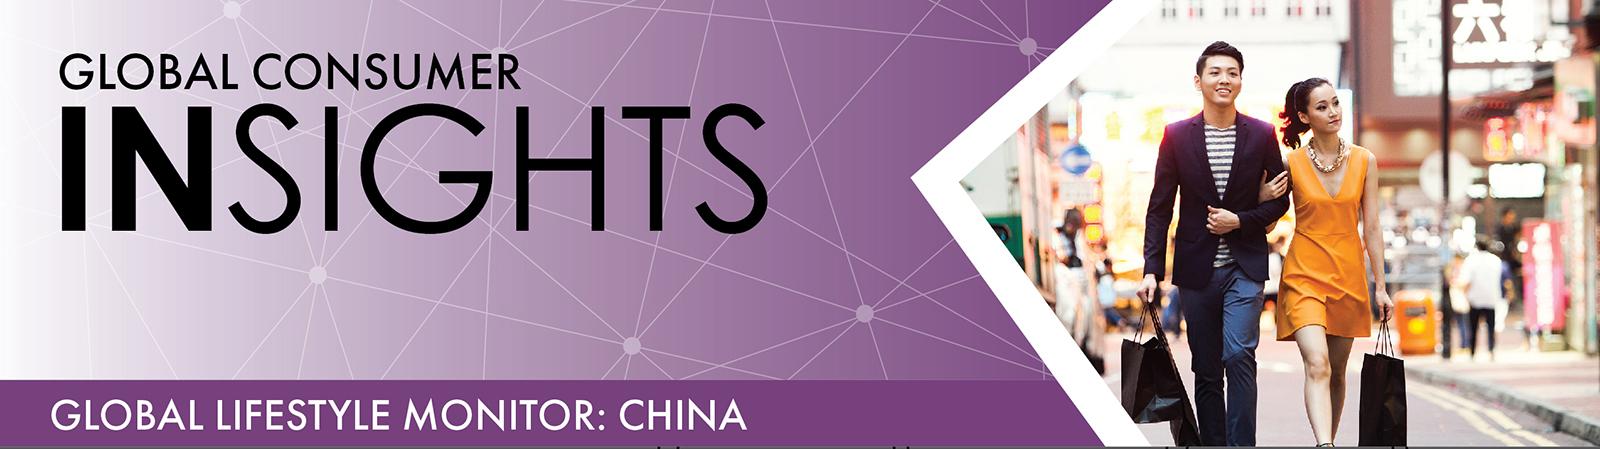 Global Lifestyle Monitor: China